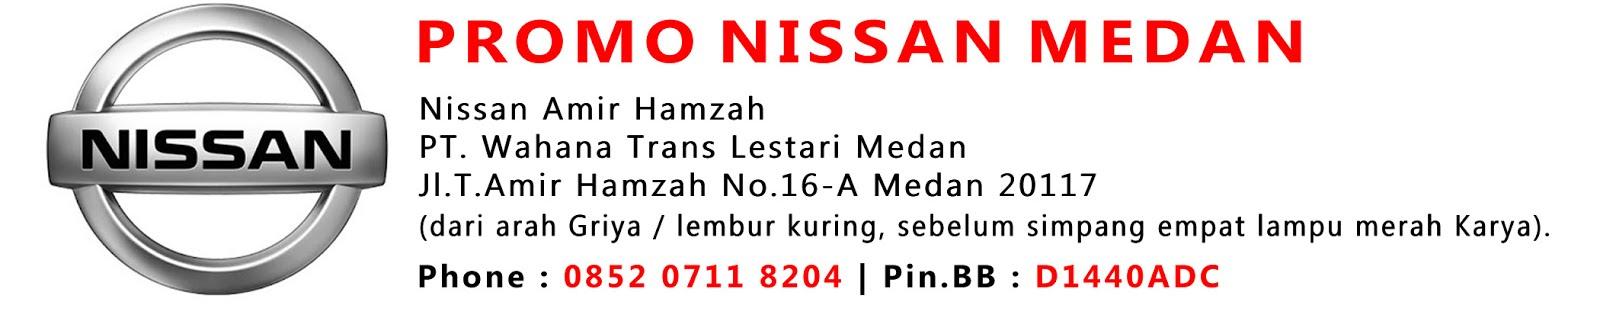 Promo Nissan Medan